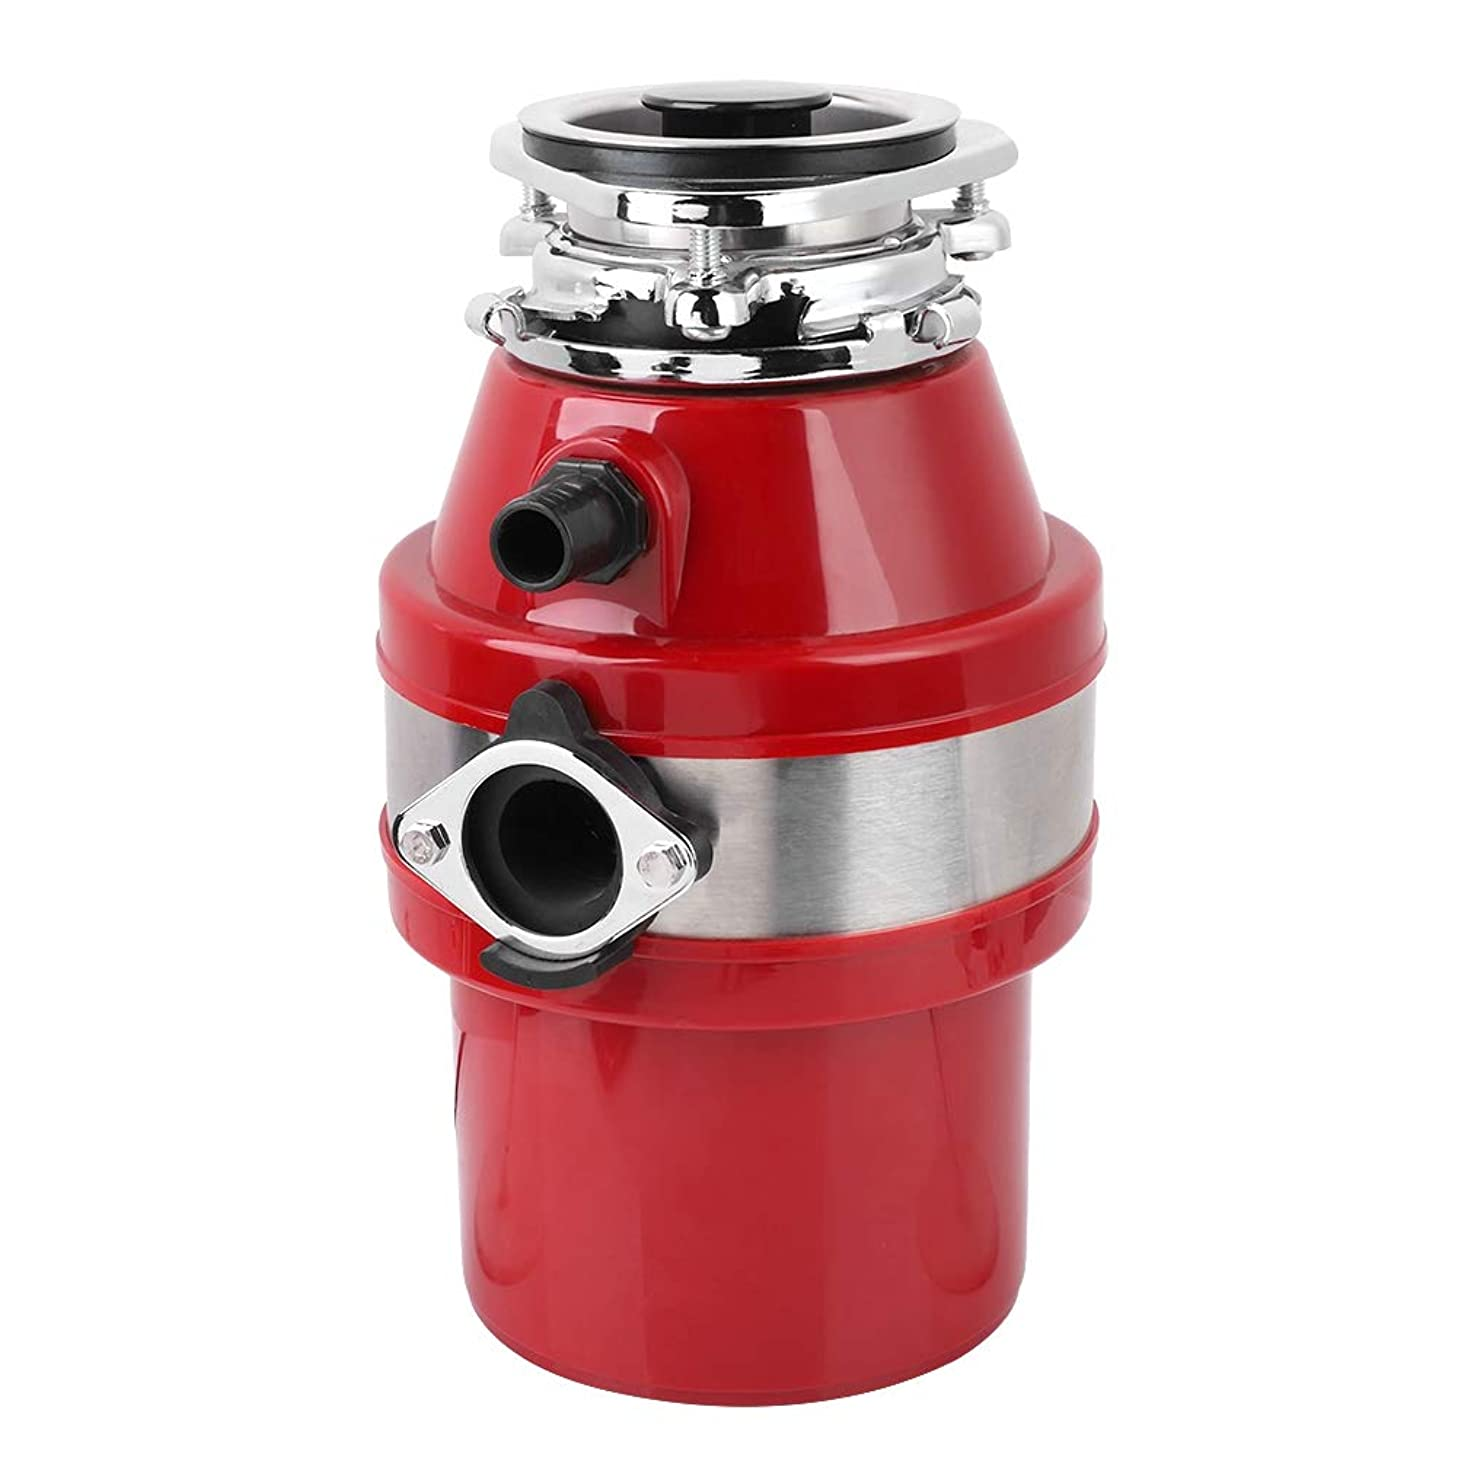 Durable Garbage Disposal, Household Food Waste Disposer, 4000rmp 3/4 HP 550W, US Plug